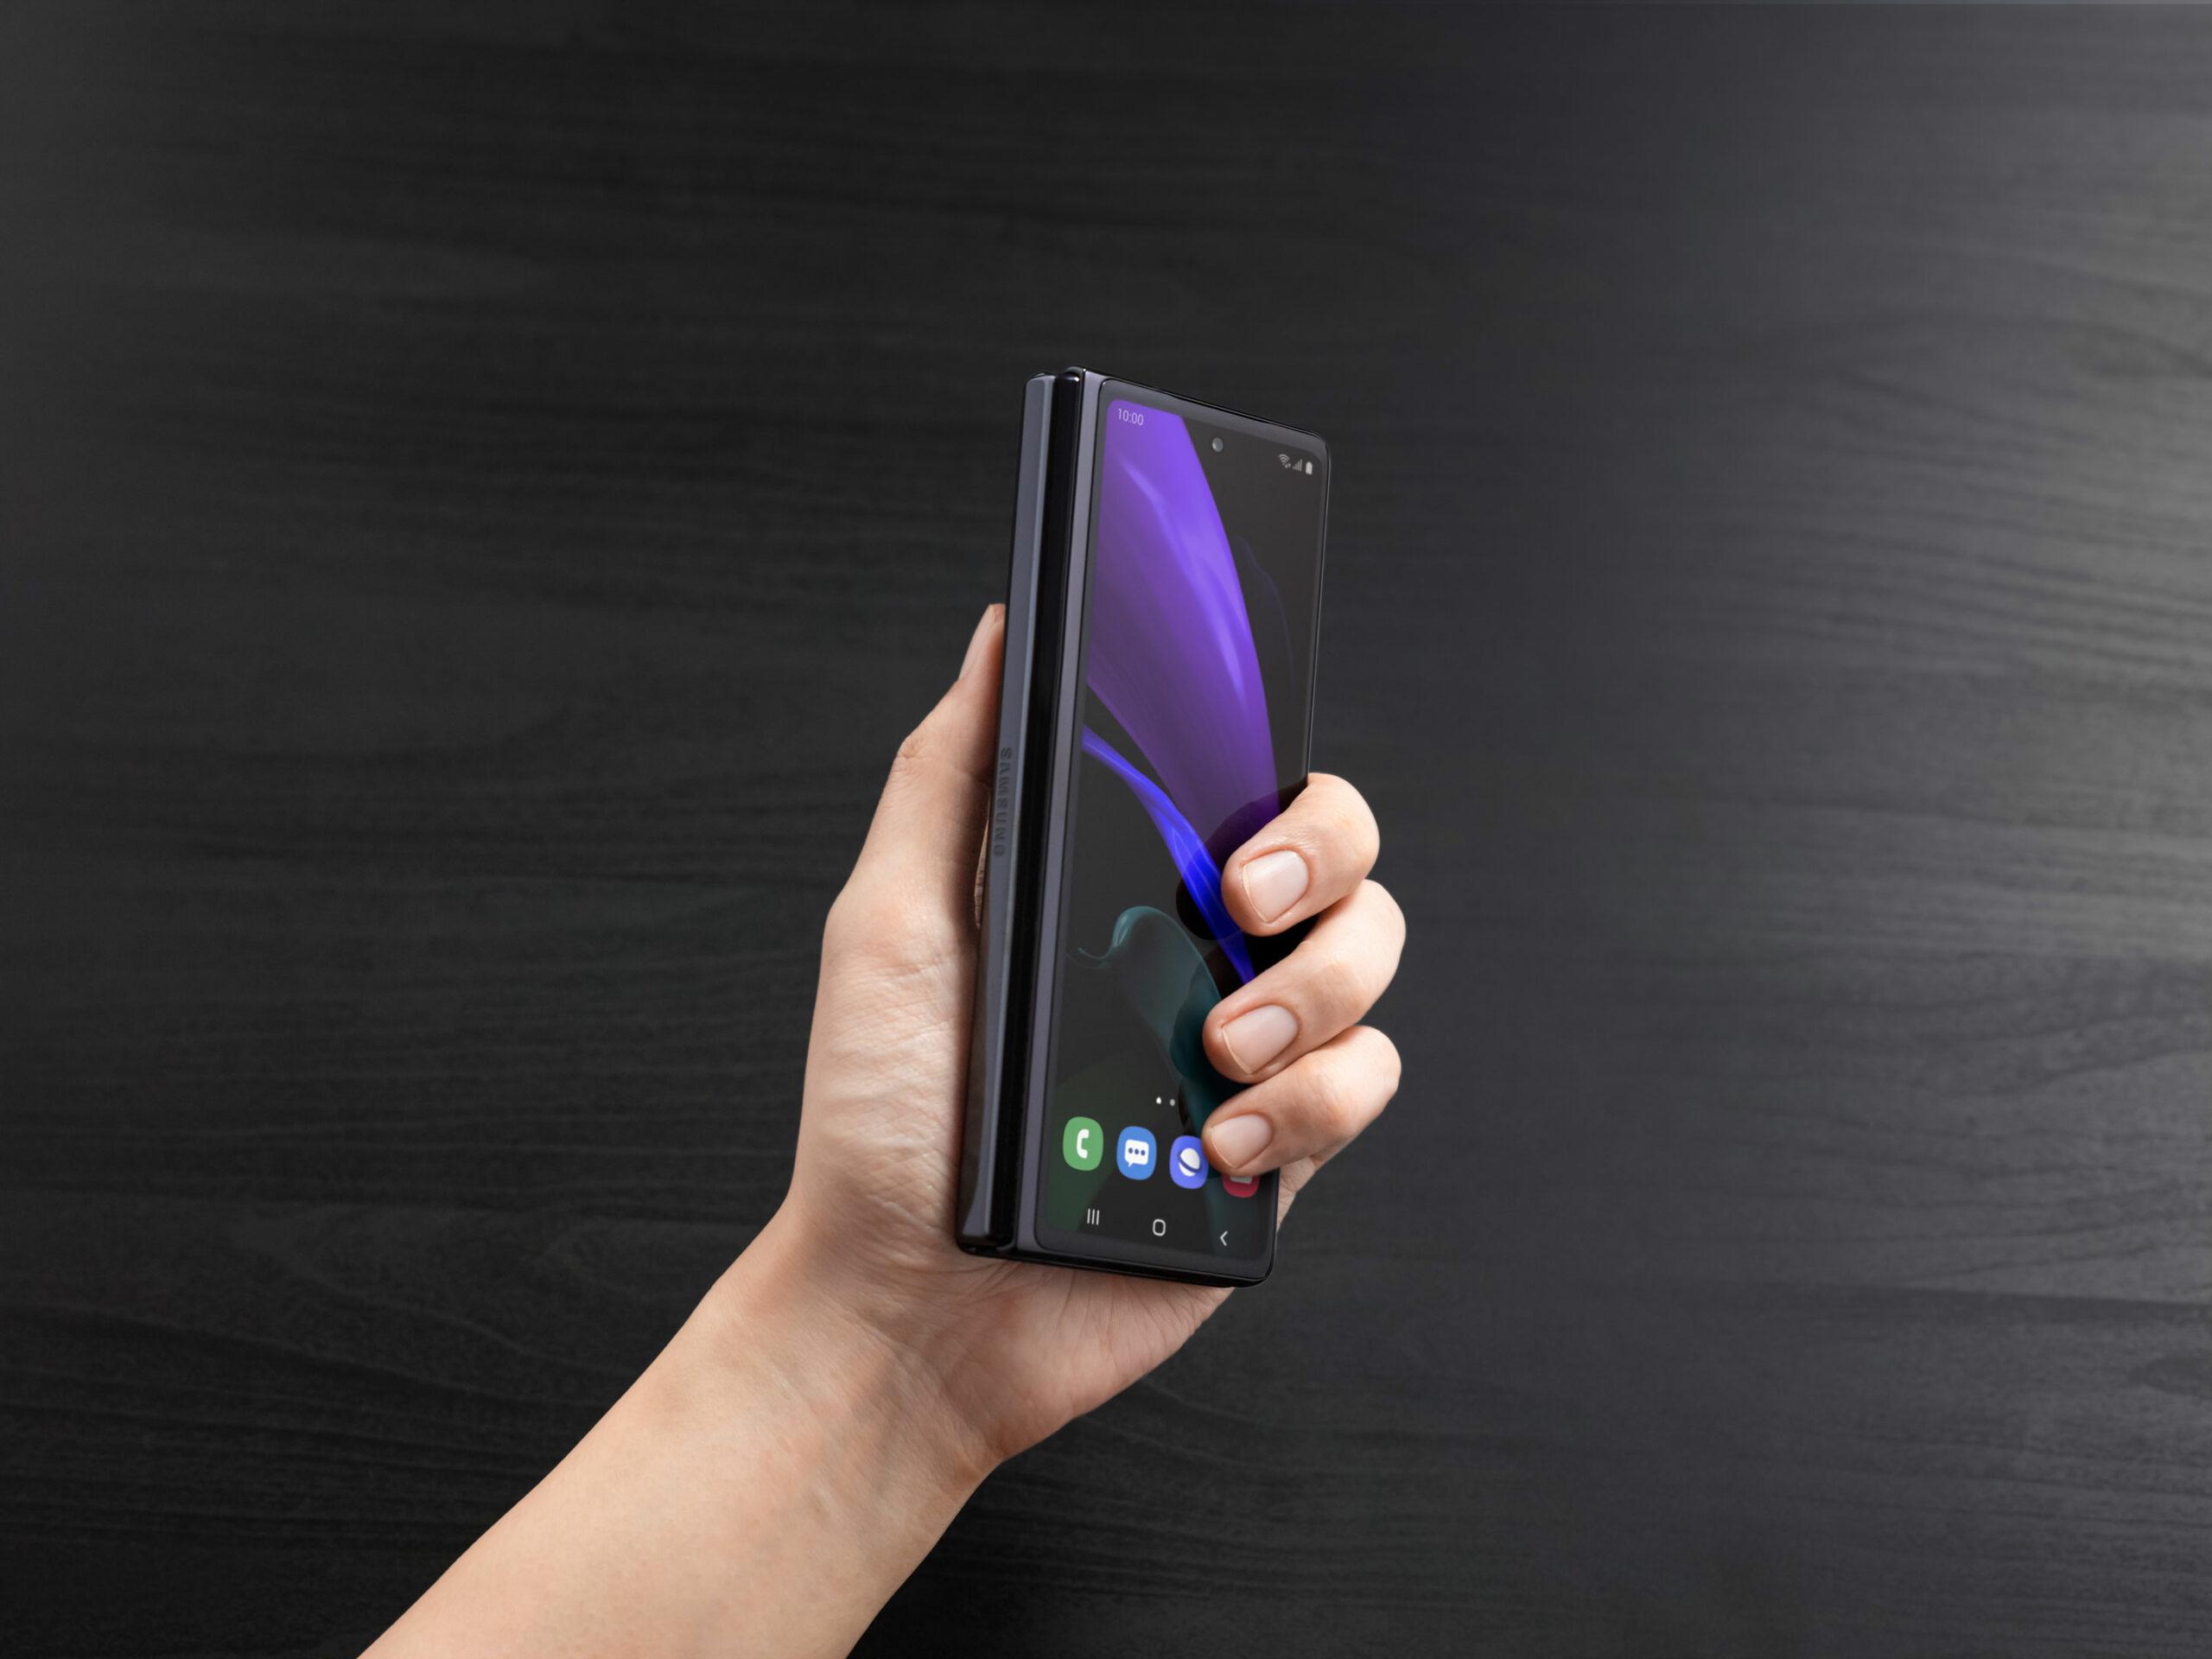 Galaxy Z Fold front display